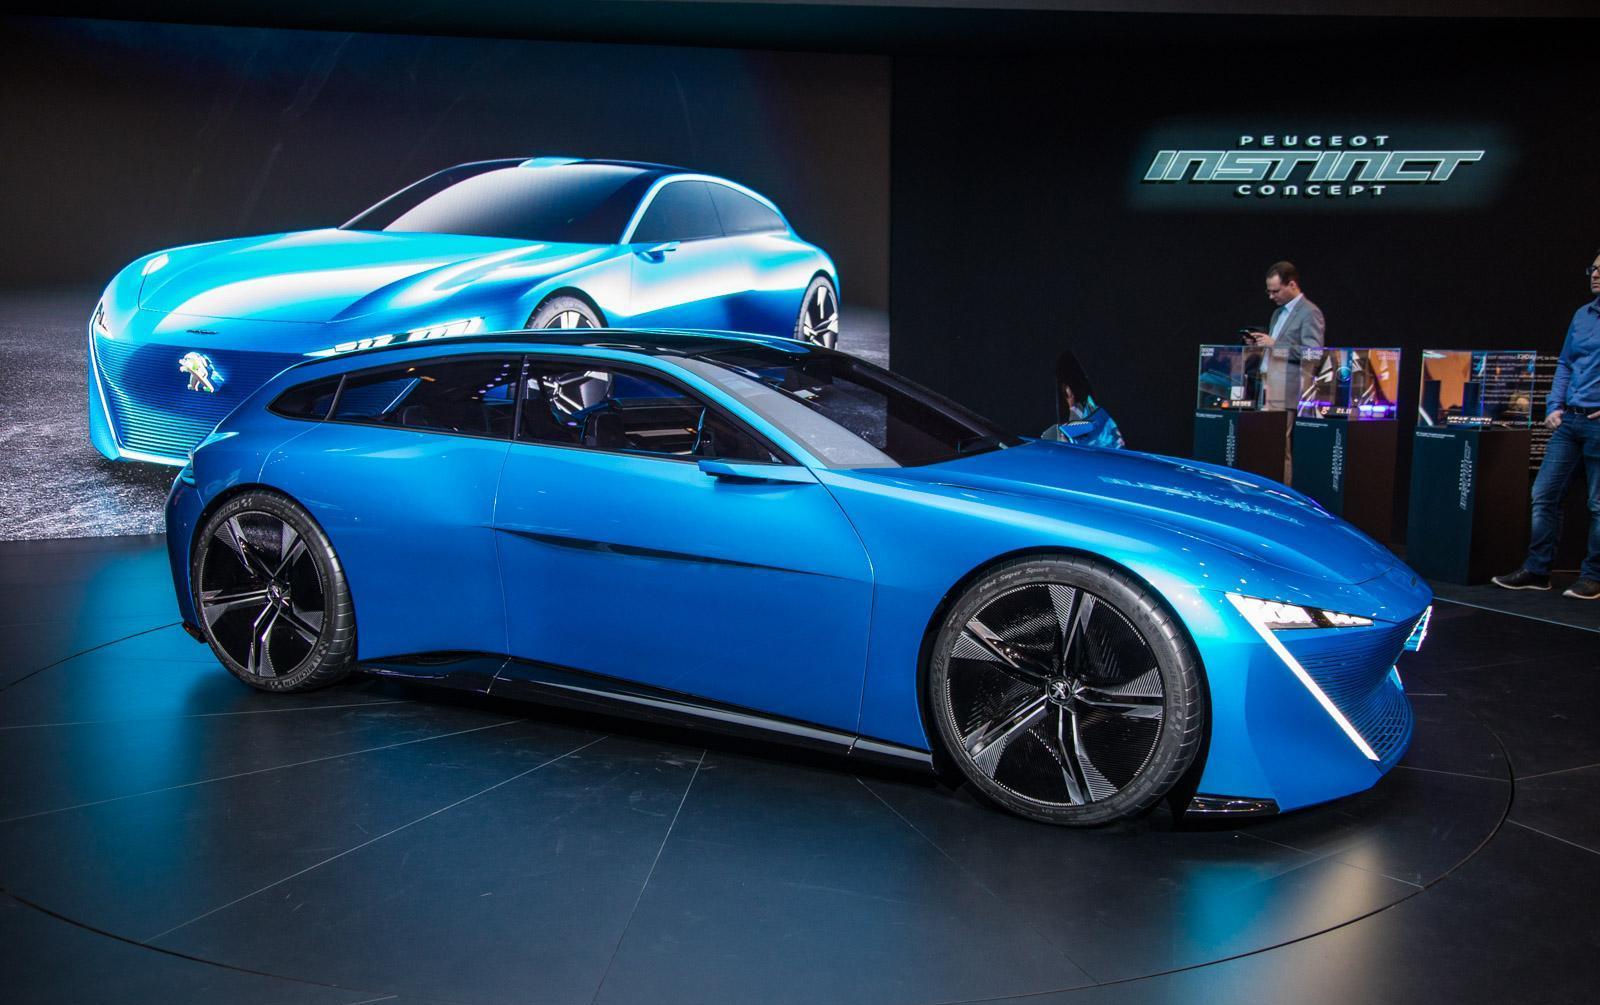 Peugeot-instinct-concept-023